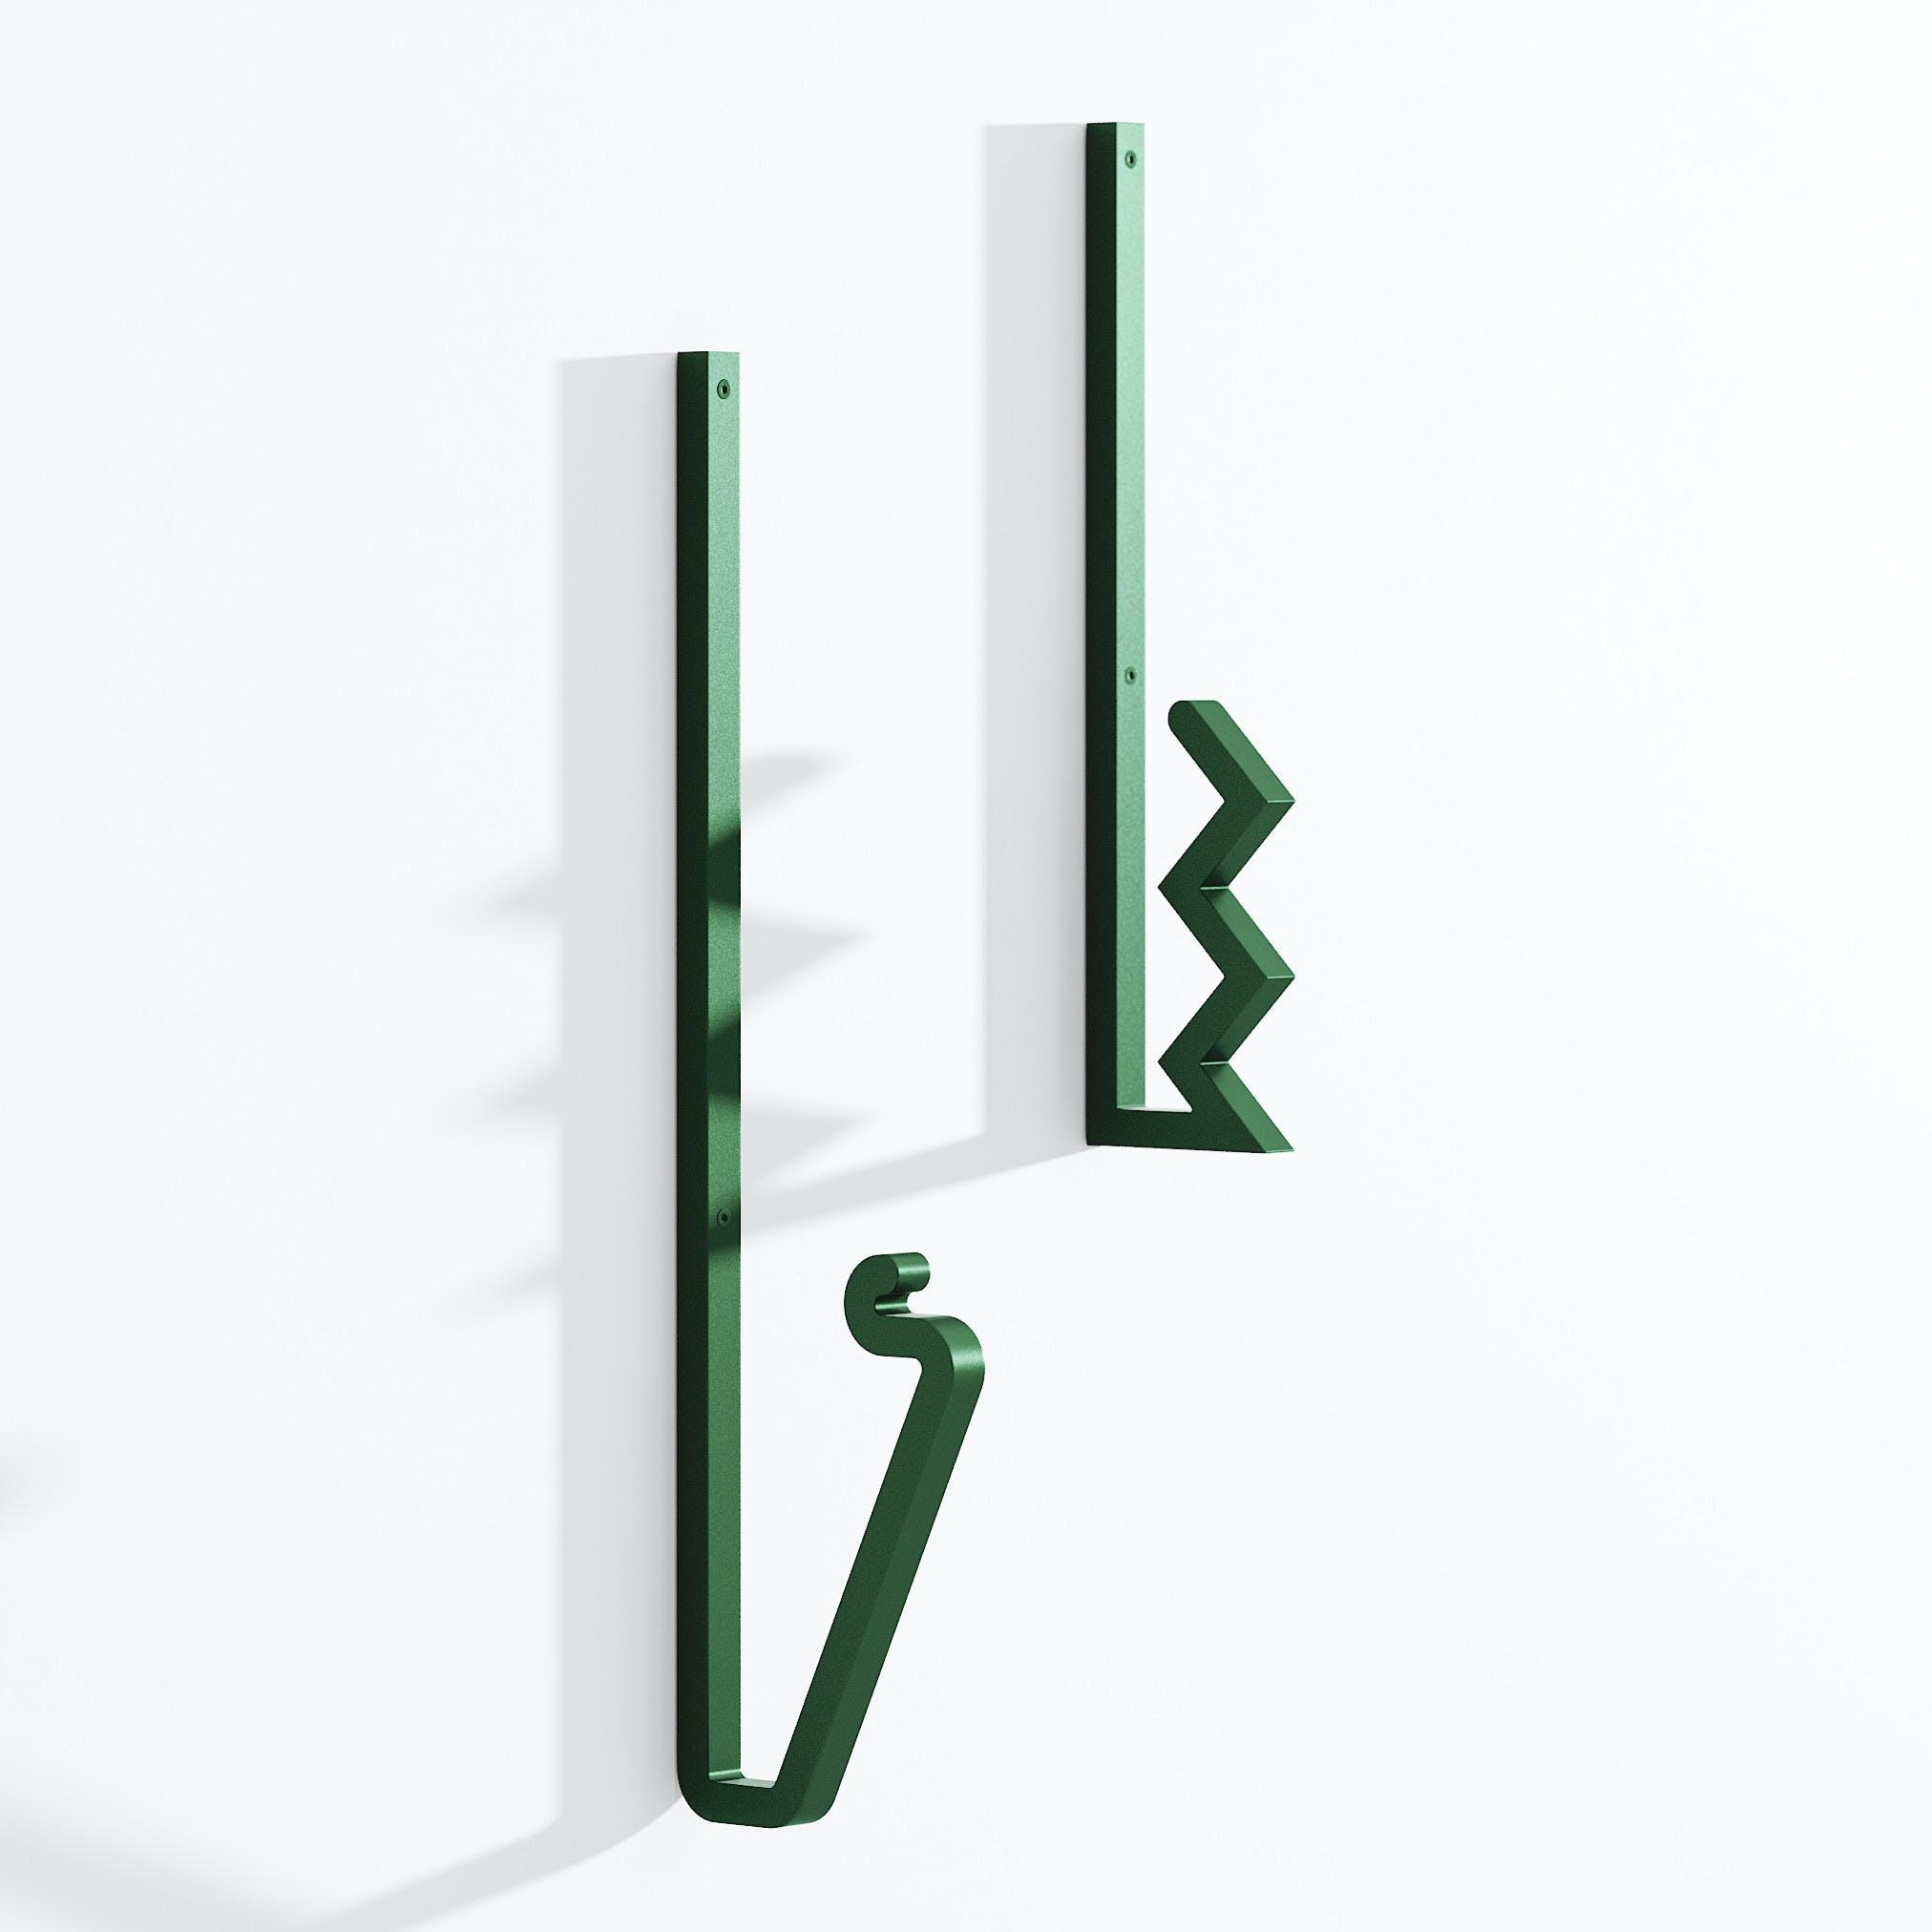 La-chance-furniture-zag-coat-hook-green-haute-living